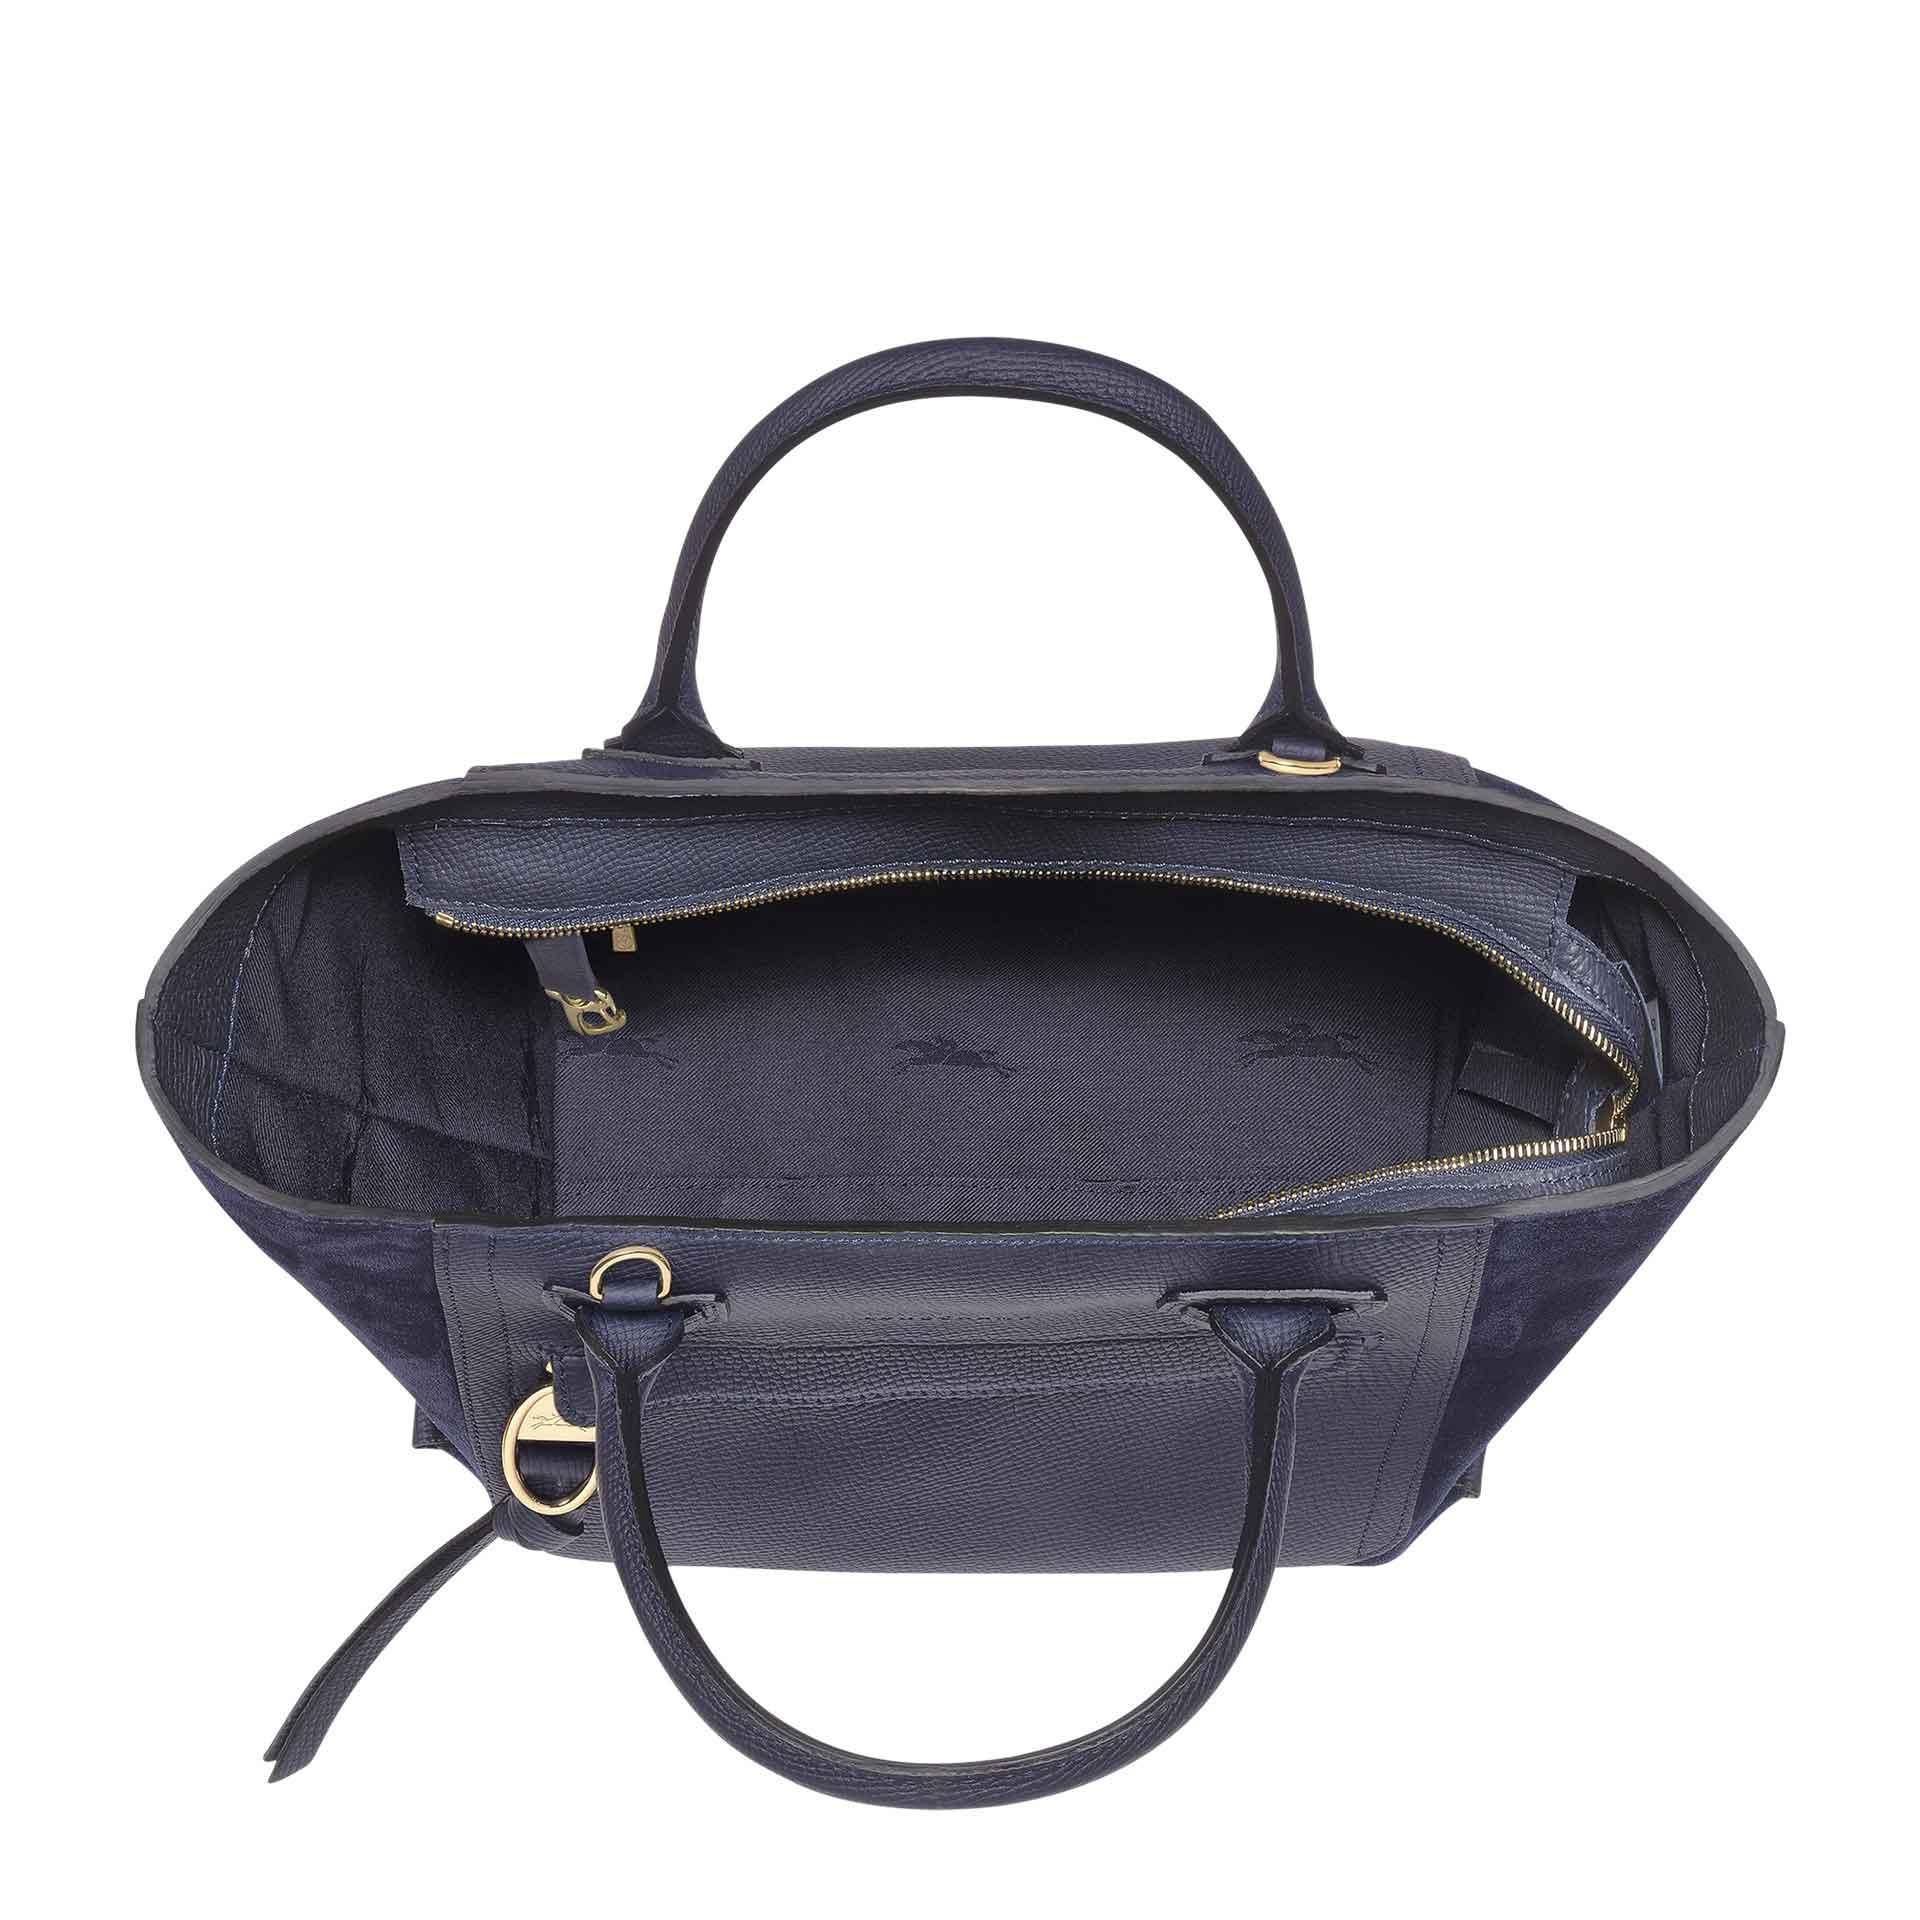 Longchamp Mailbox Handtasche navy